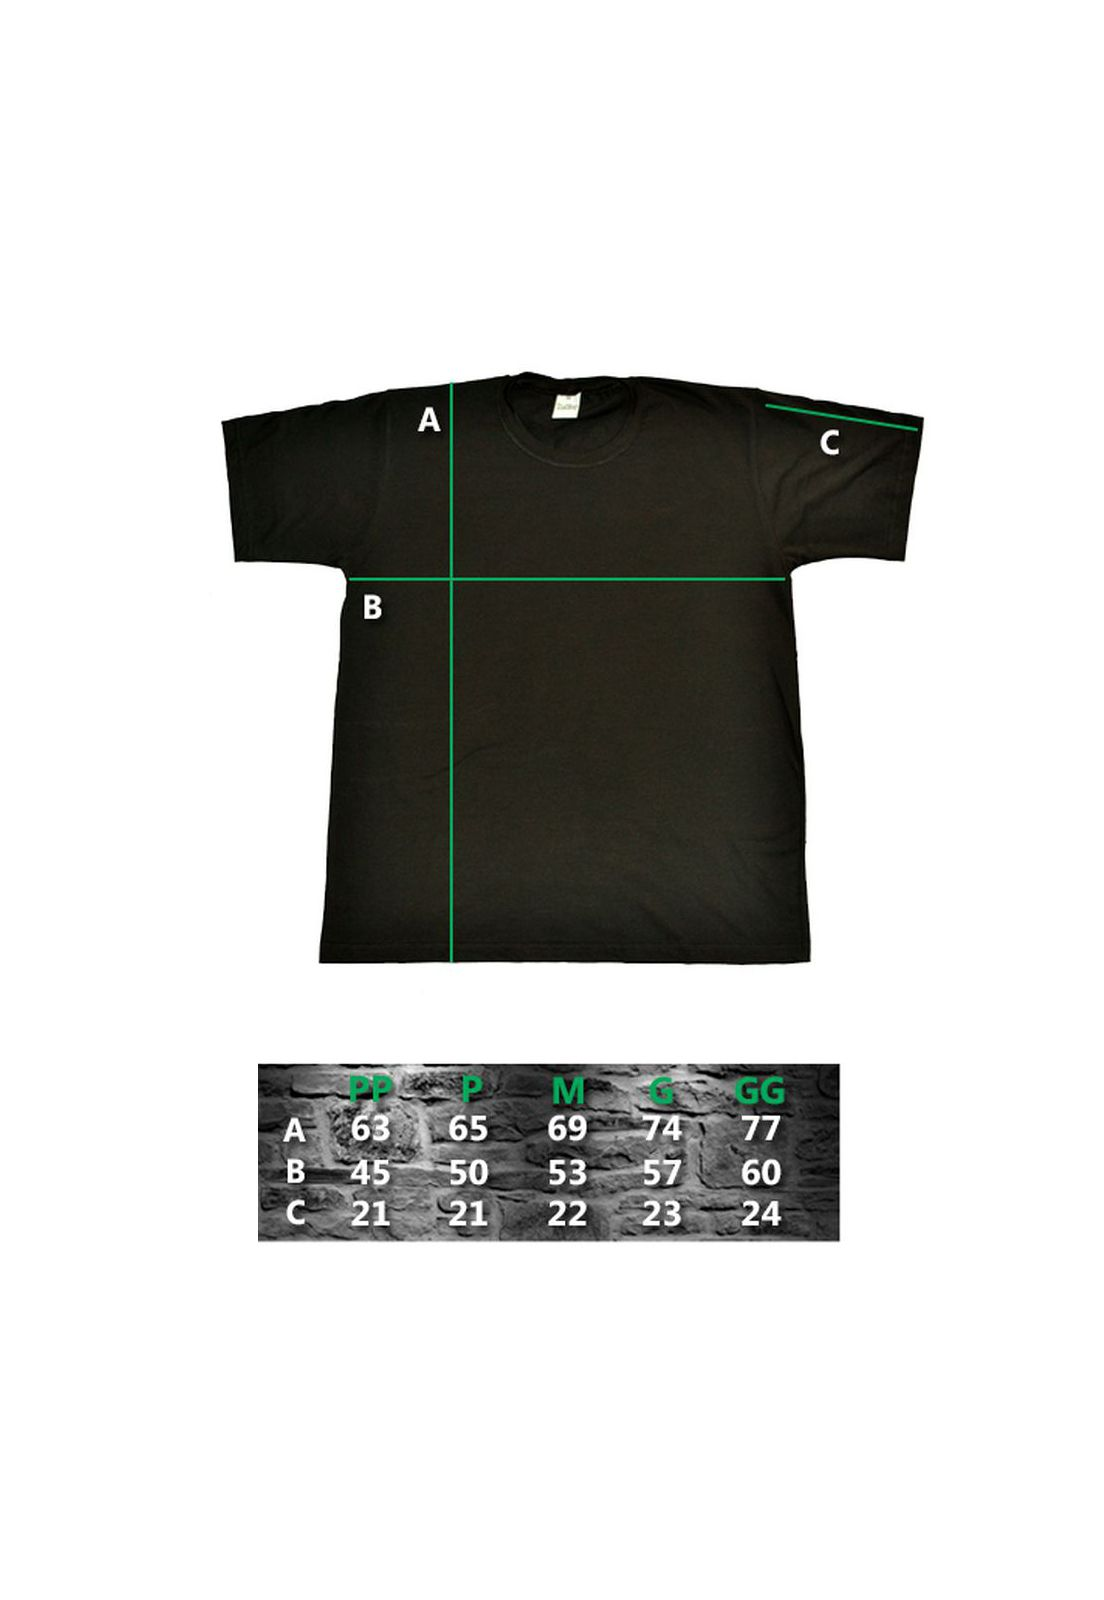 Camiseta God of War - Kratos - Branca  - HShop